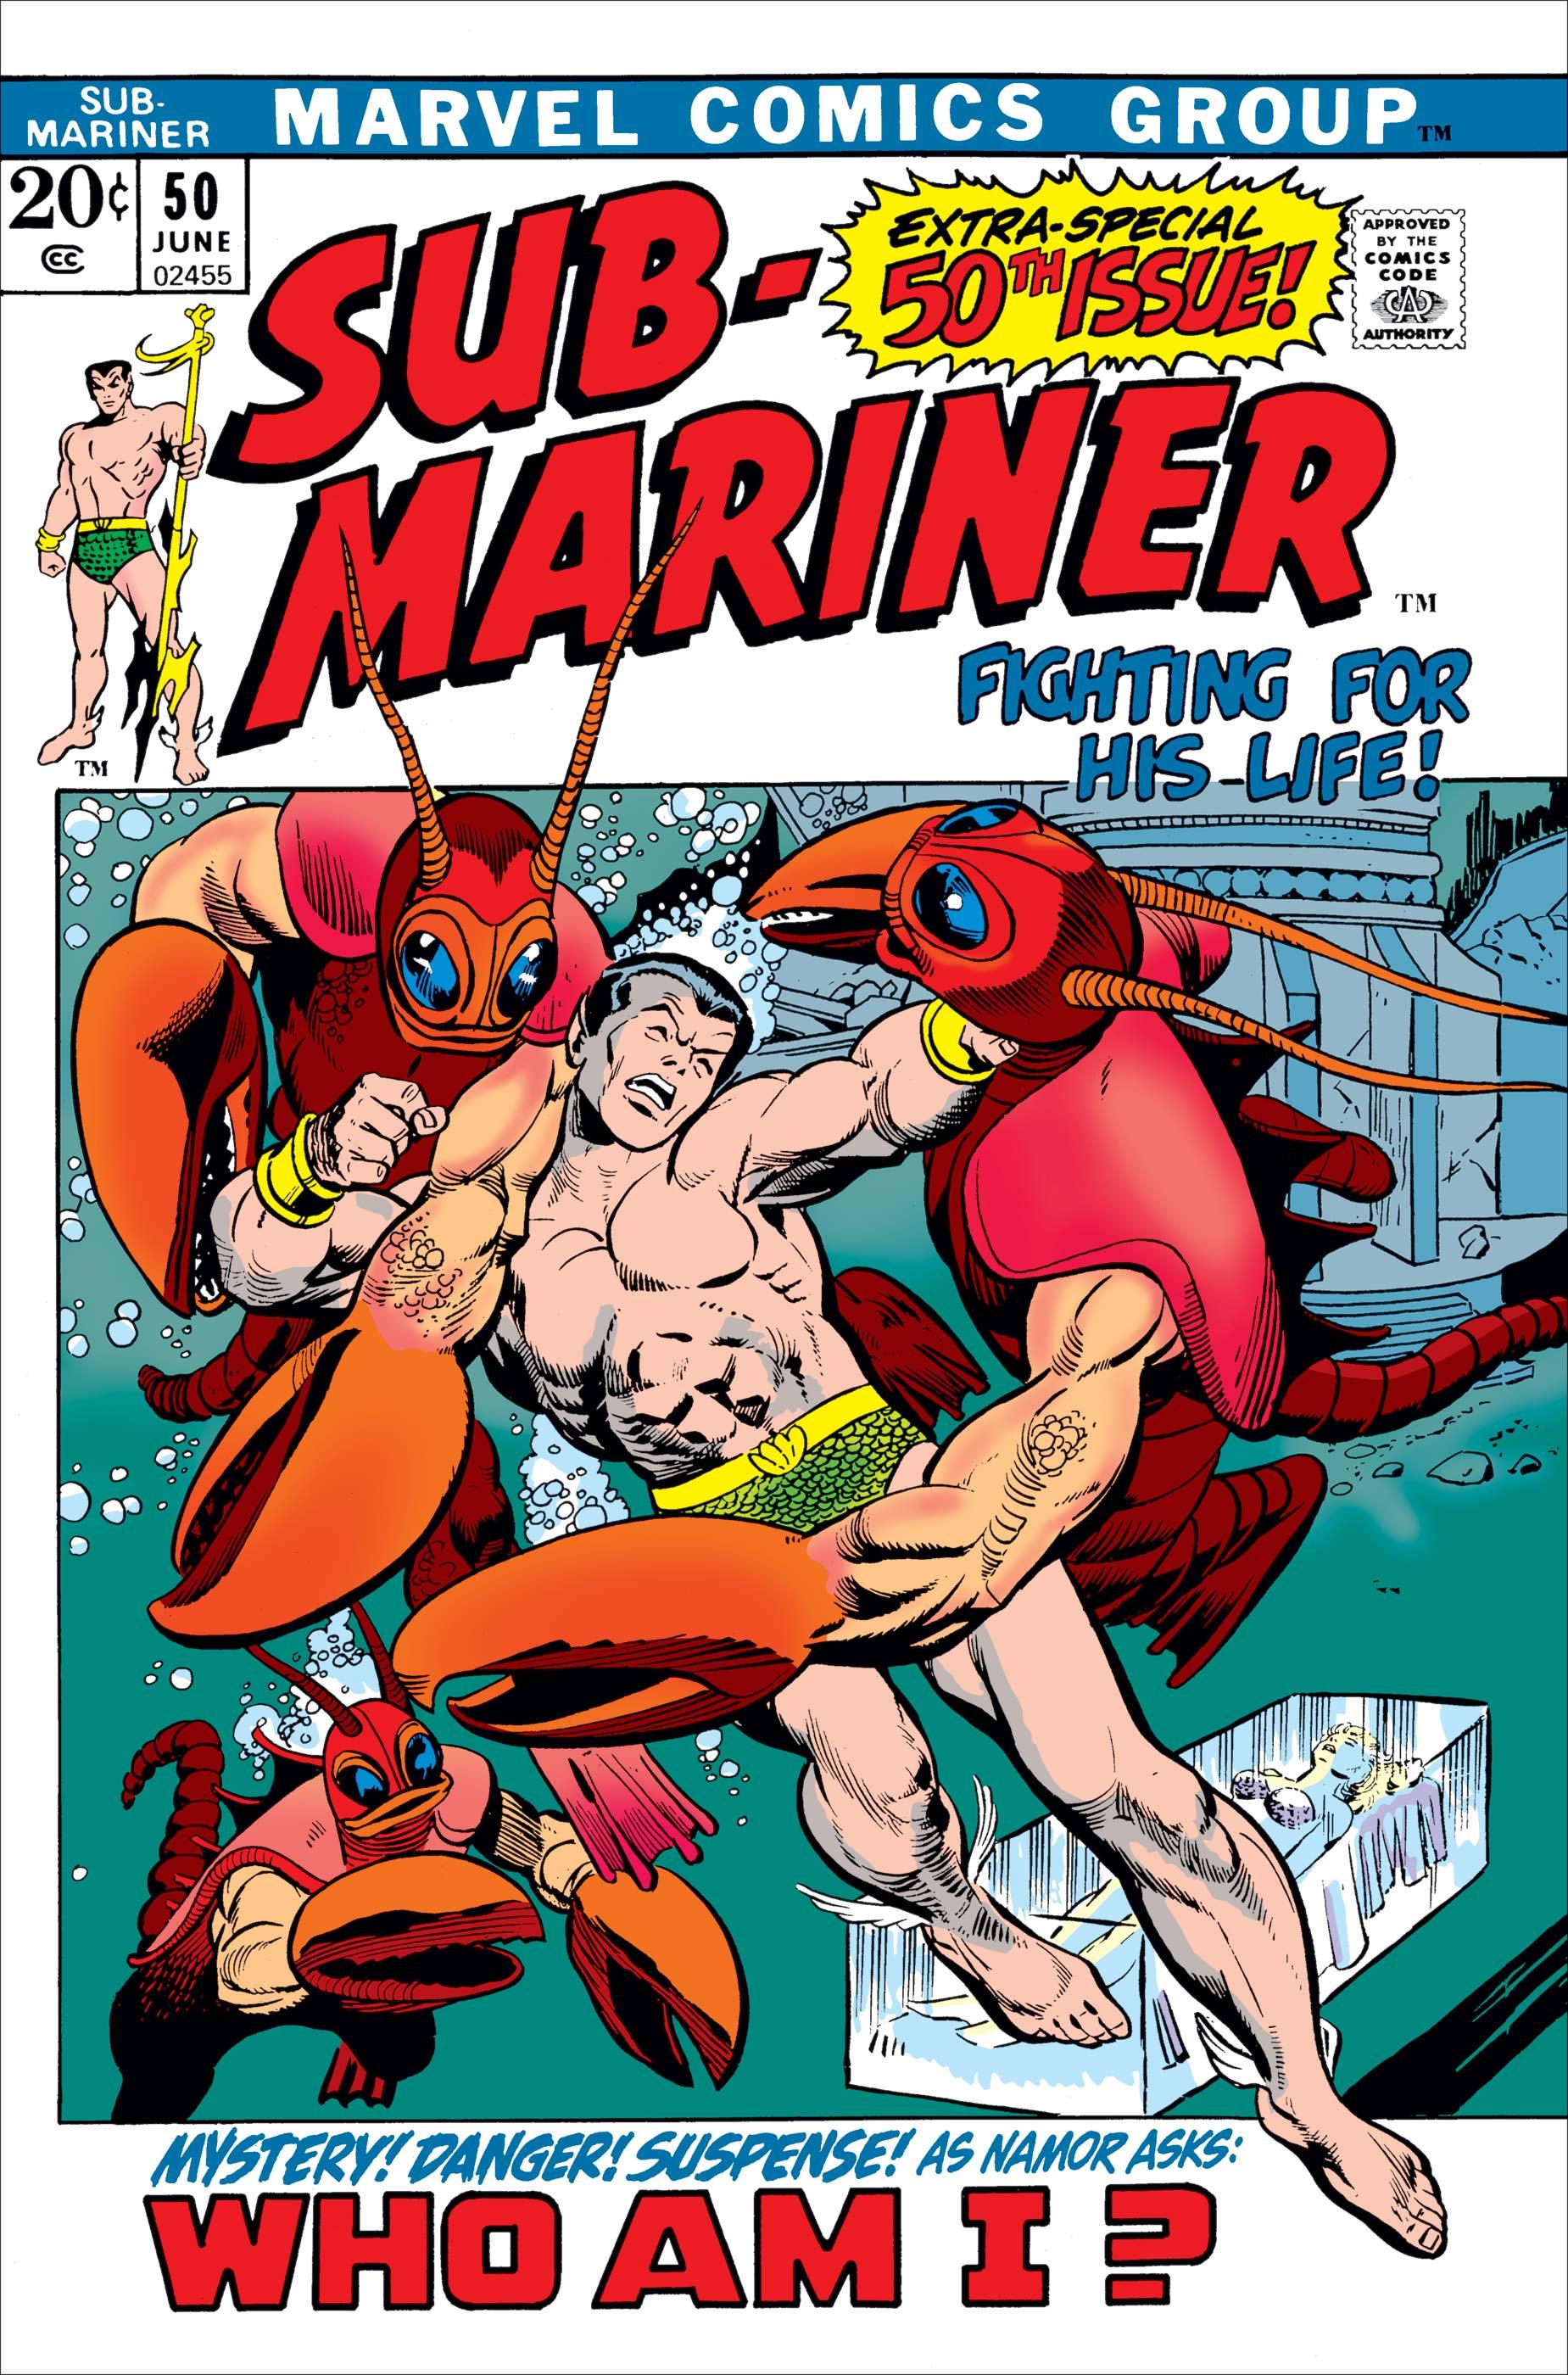 Sub-Mariner (1968) #50